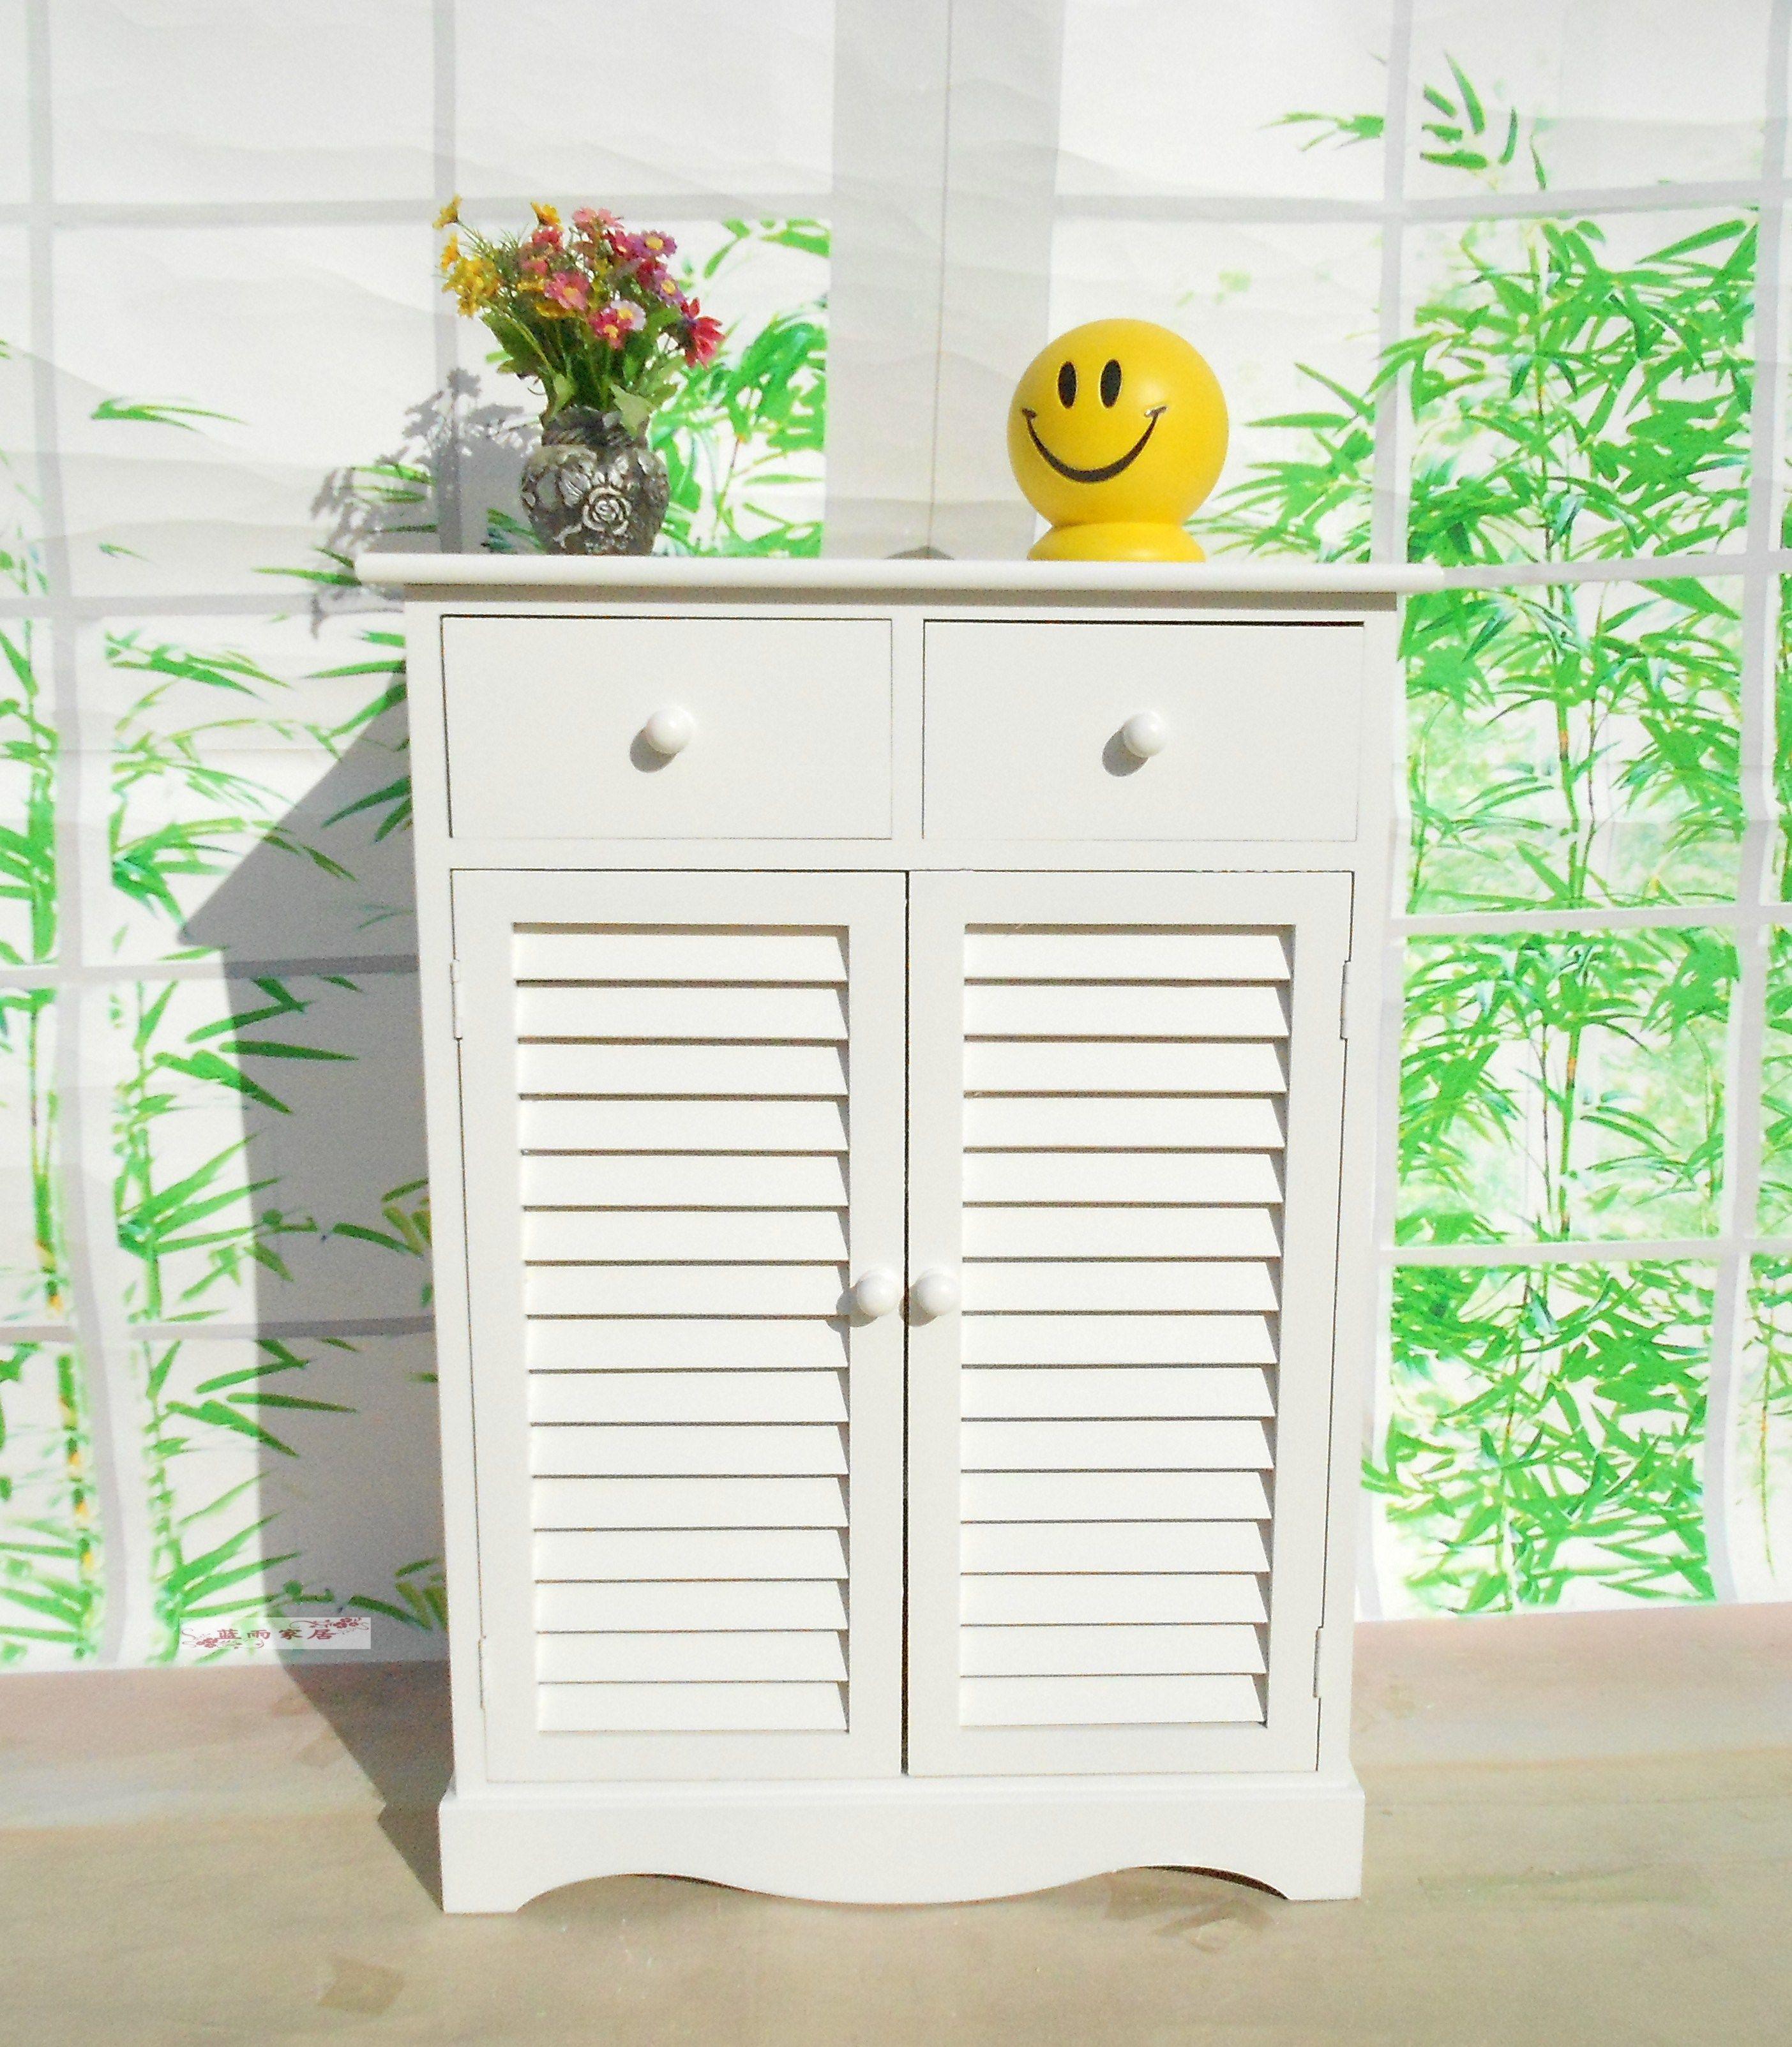 Wood For Shoe Fashion Living Room Cabinet Rustic Storage Shutter Door Kitchen Drawer